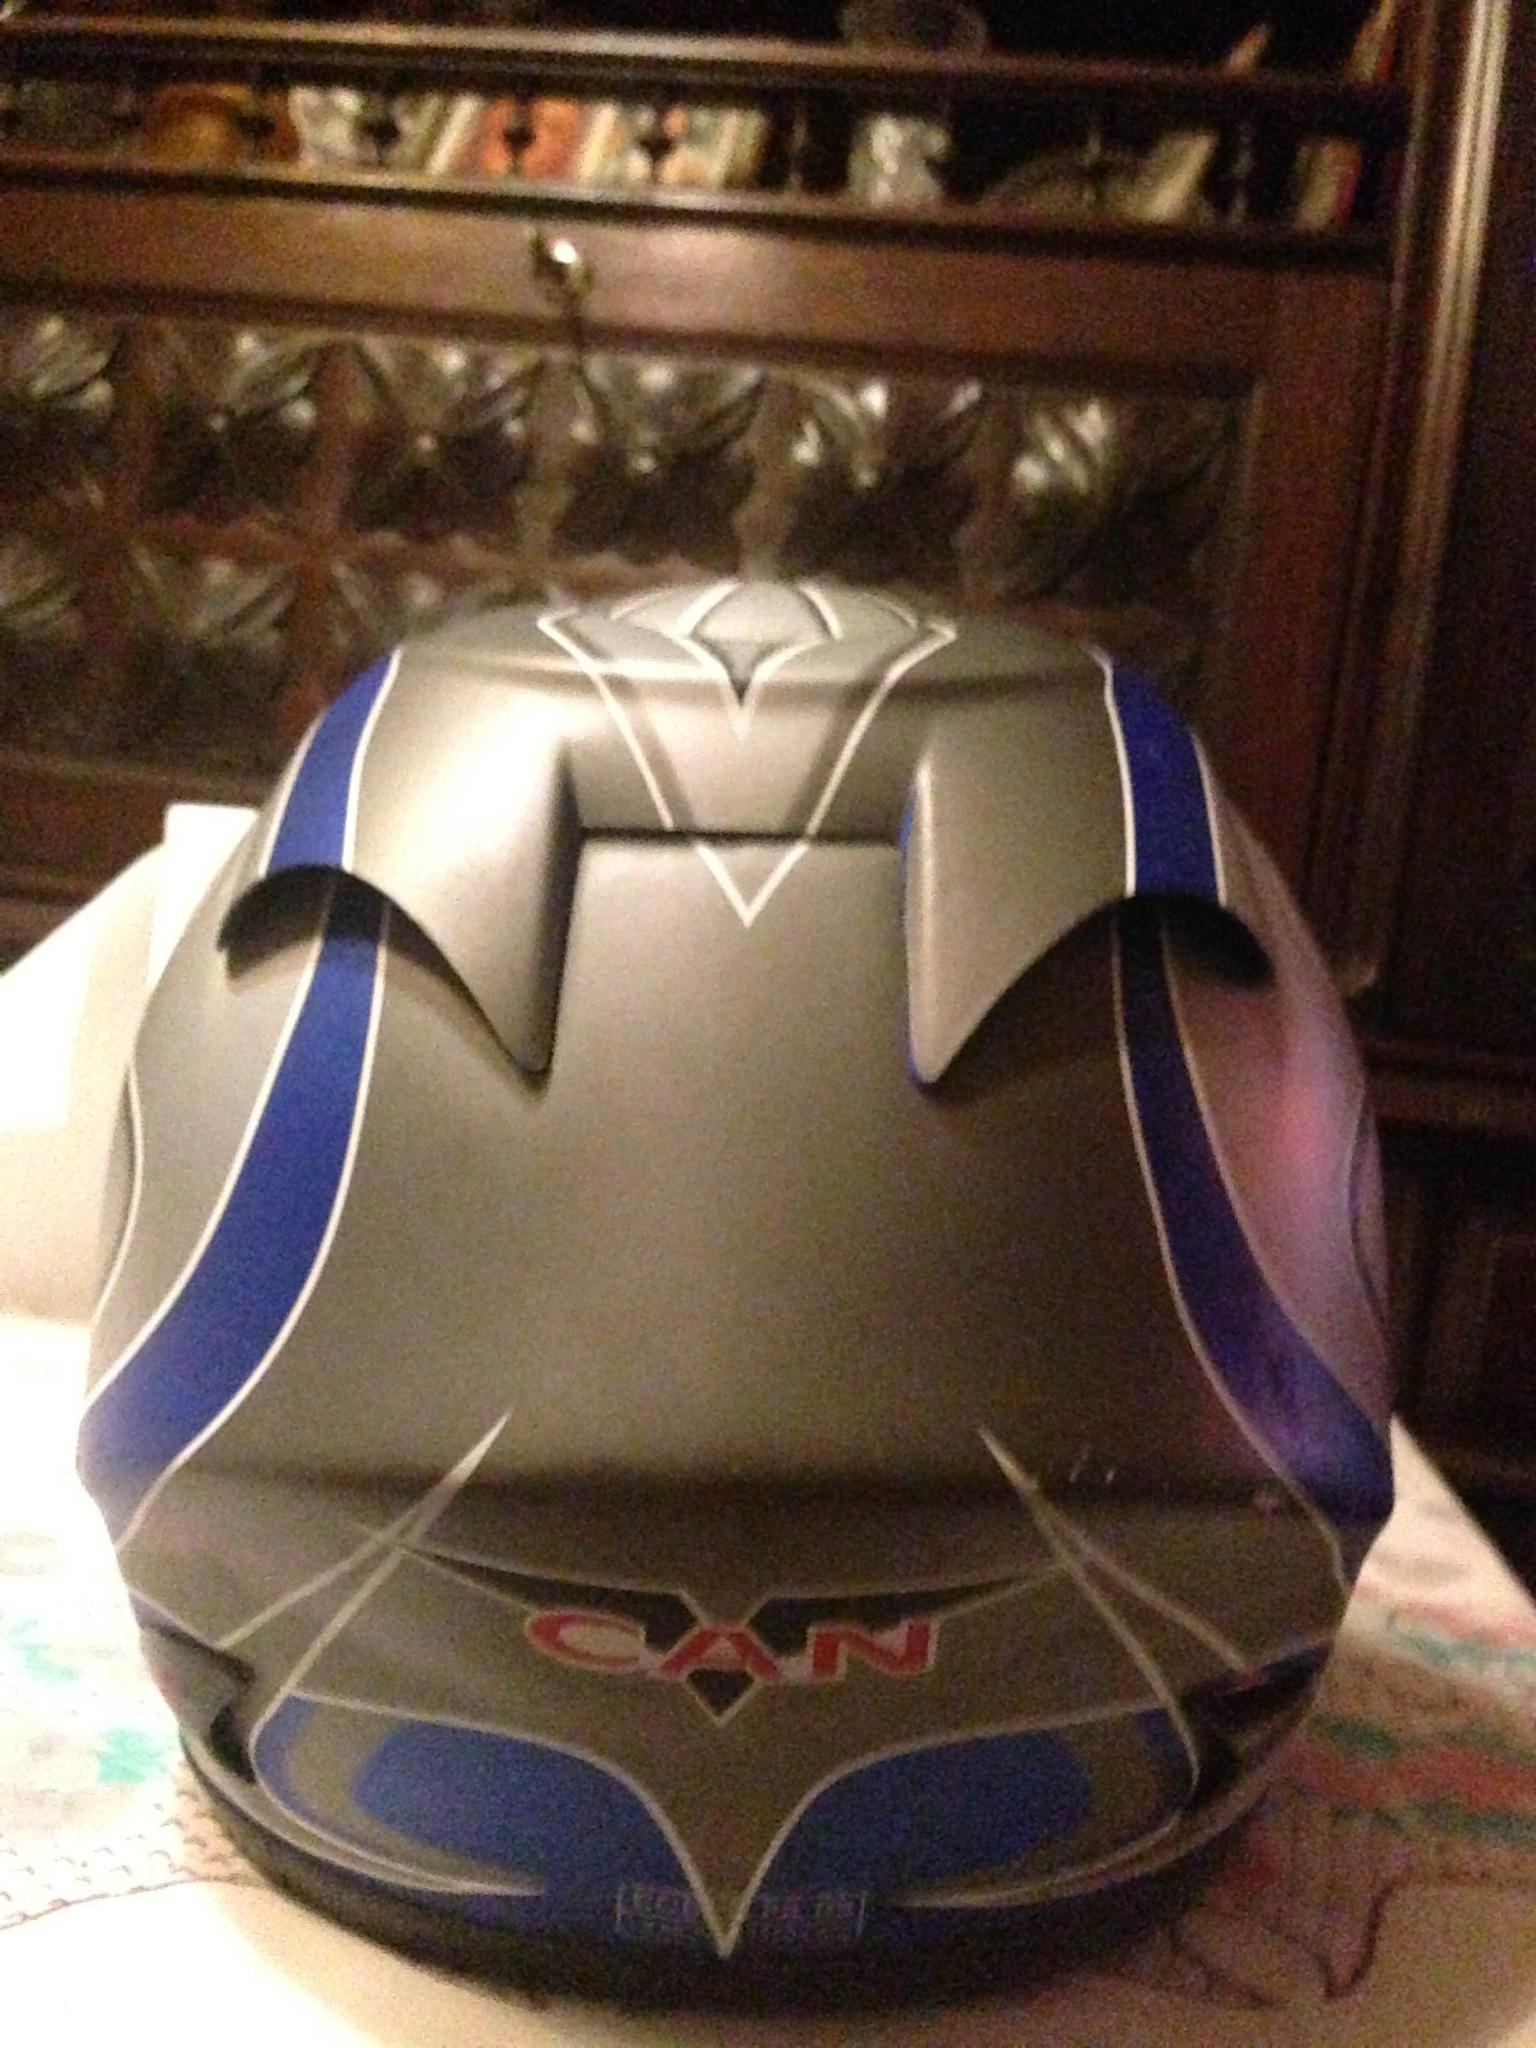 Autocolantes na moto/capacete  9bf5md